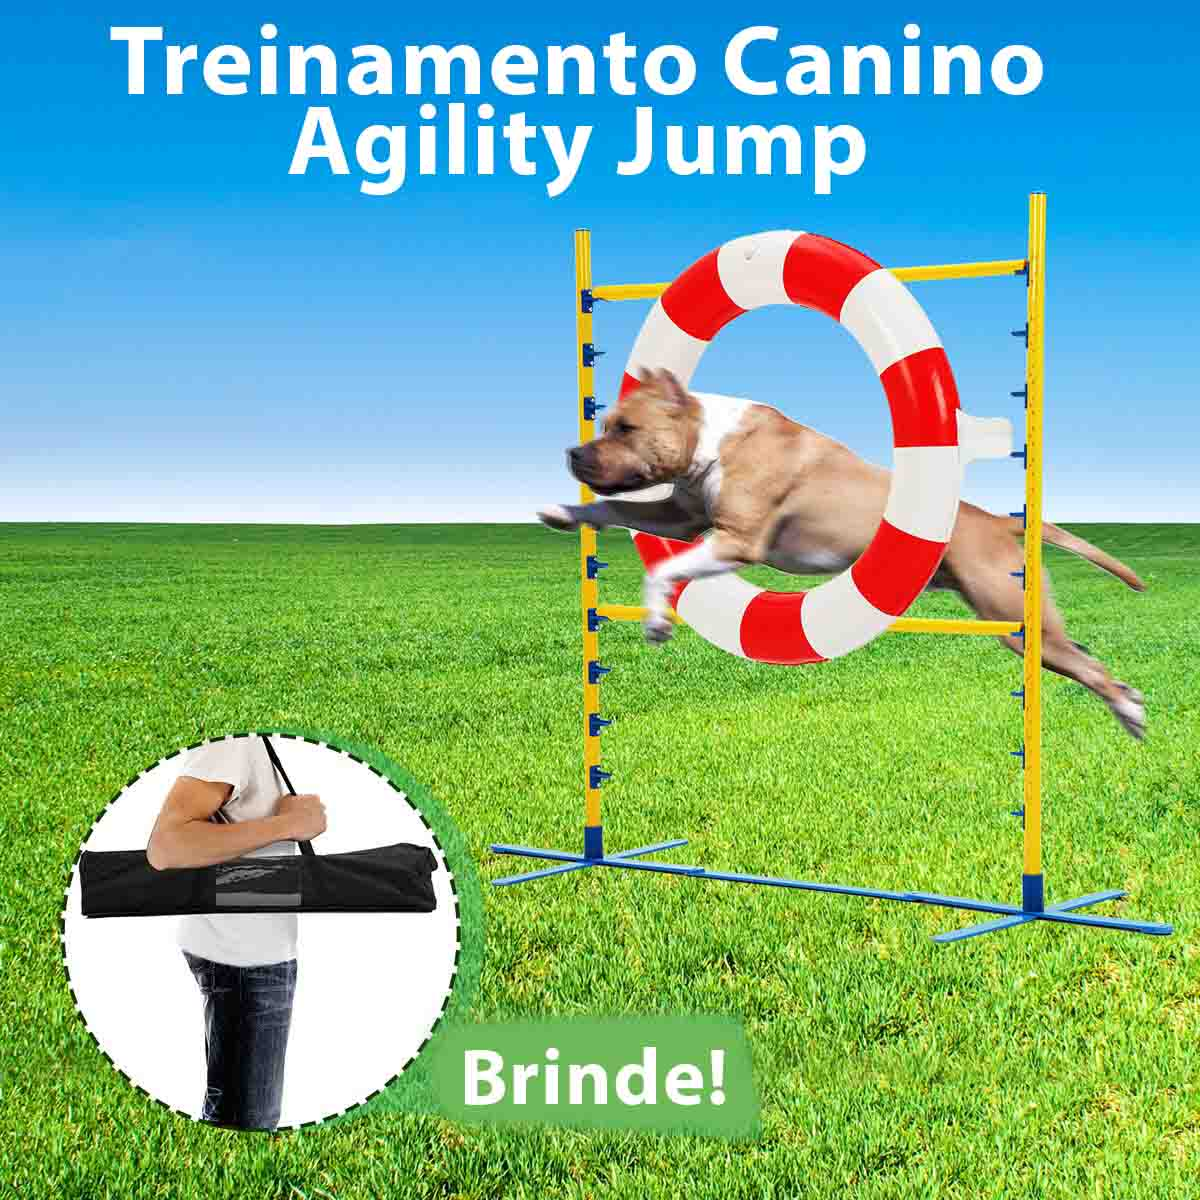 Barra com Bóia Jump Agility para Treinamento Canino Eleva Mundi